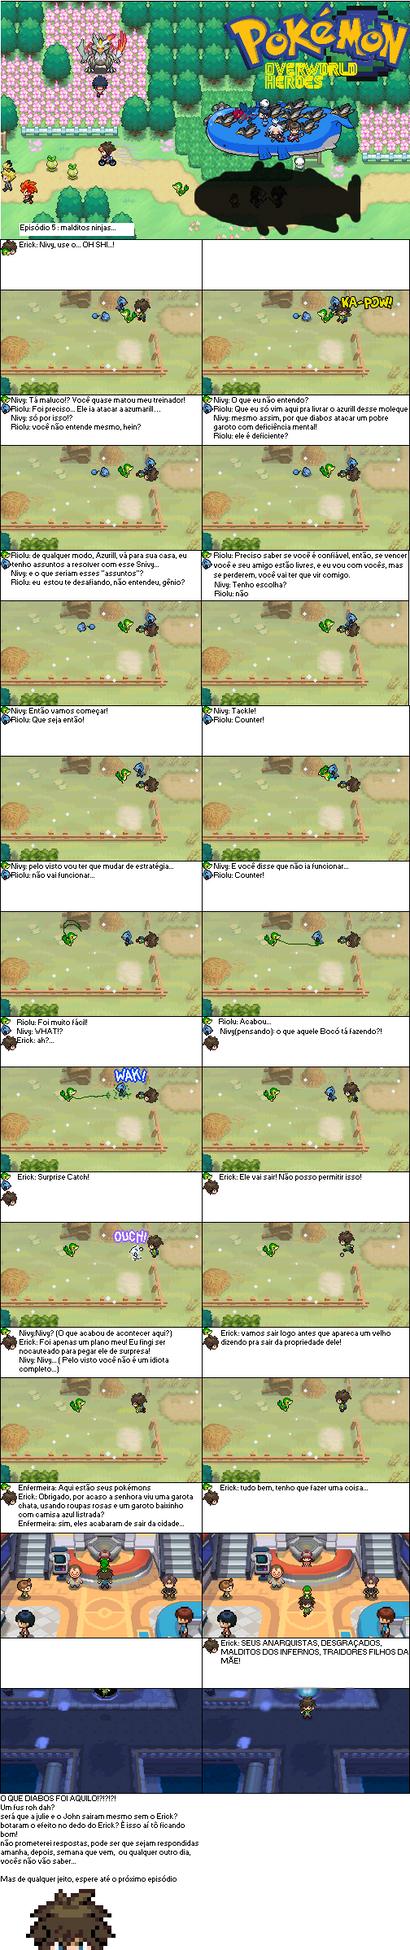 Pokemon Overworld heroes #5 Malditos ninjas... by Erick8530